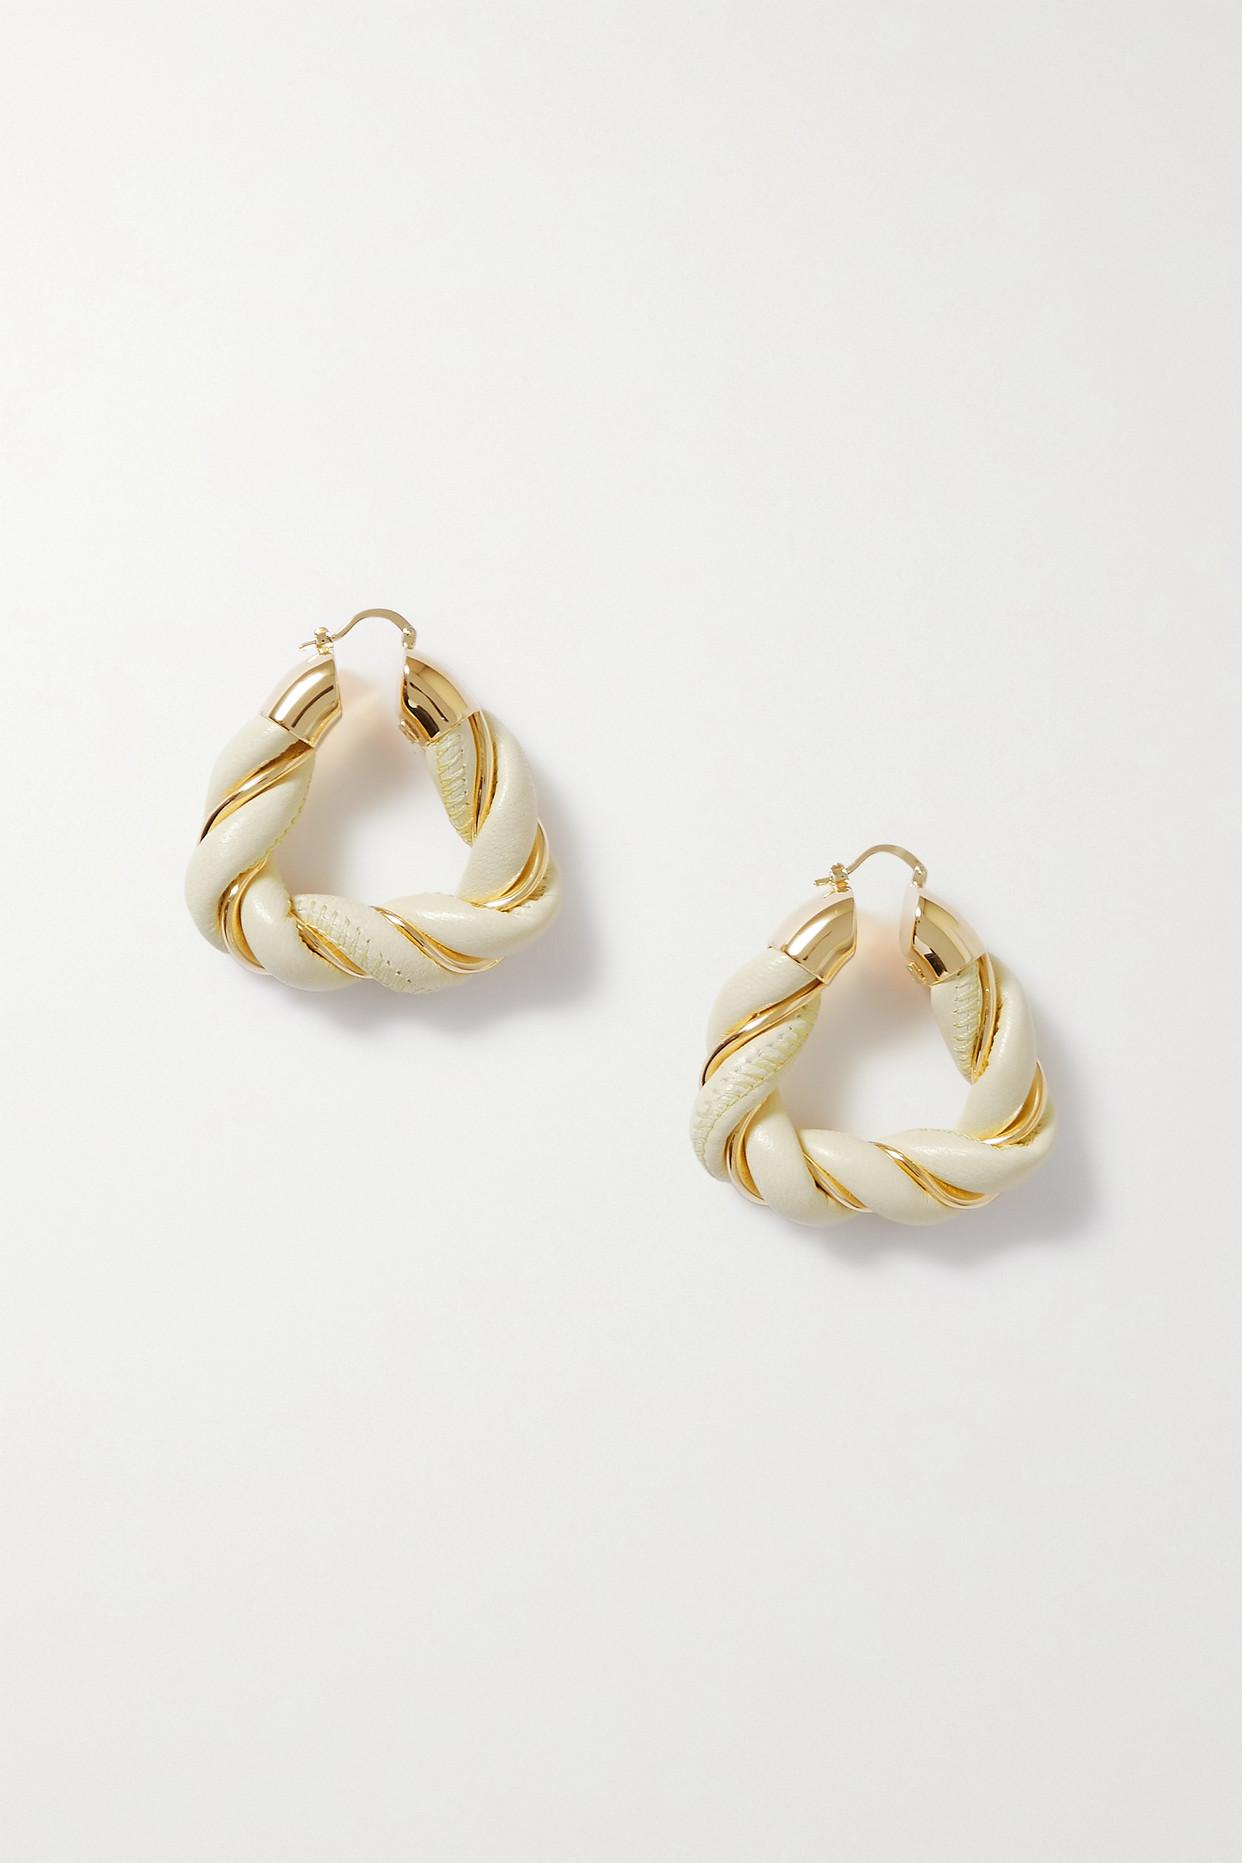 BOTTEGA VENETA - Square Twist Gold-plated And Leather Hoop Earrings - Cream - one size